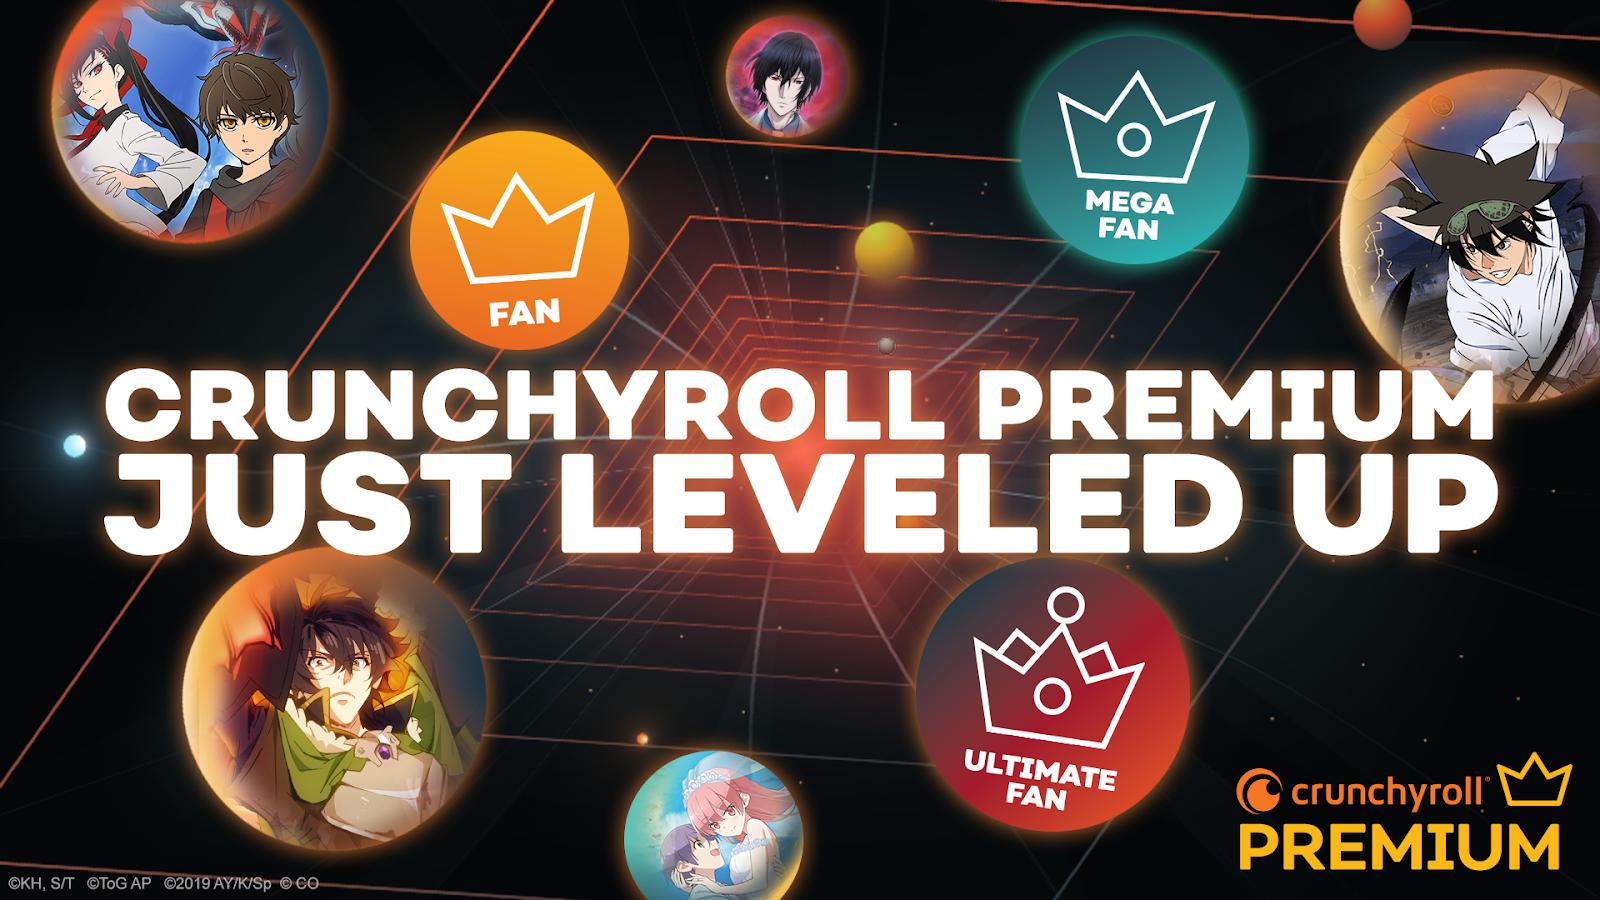 Crunchyroll Premium Tiers